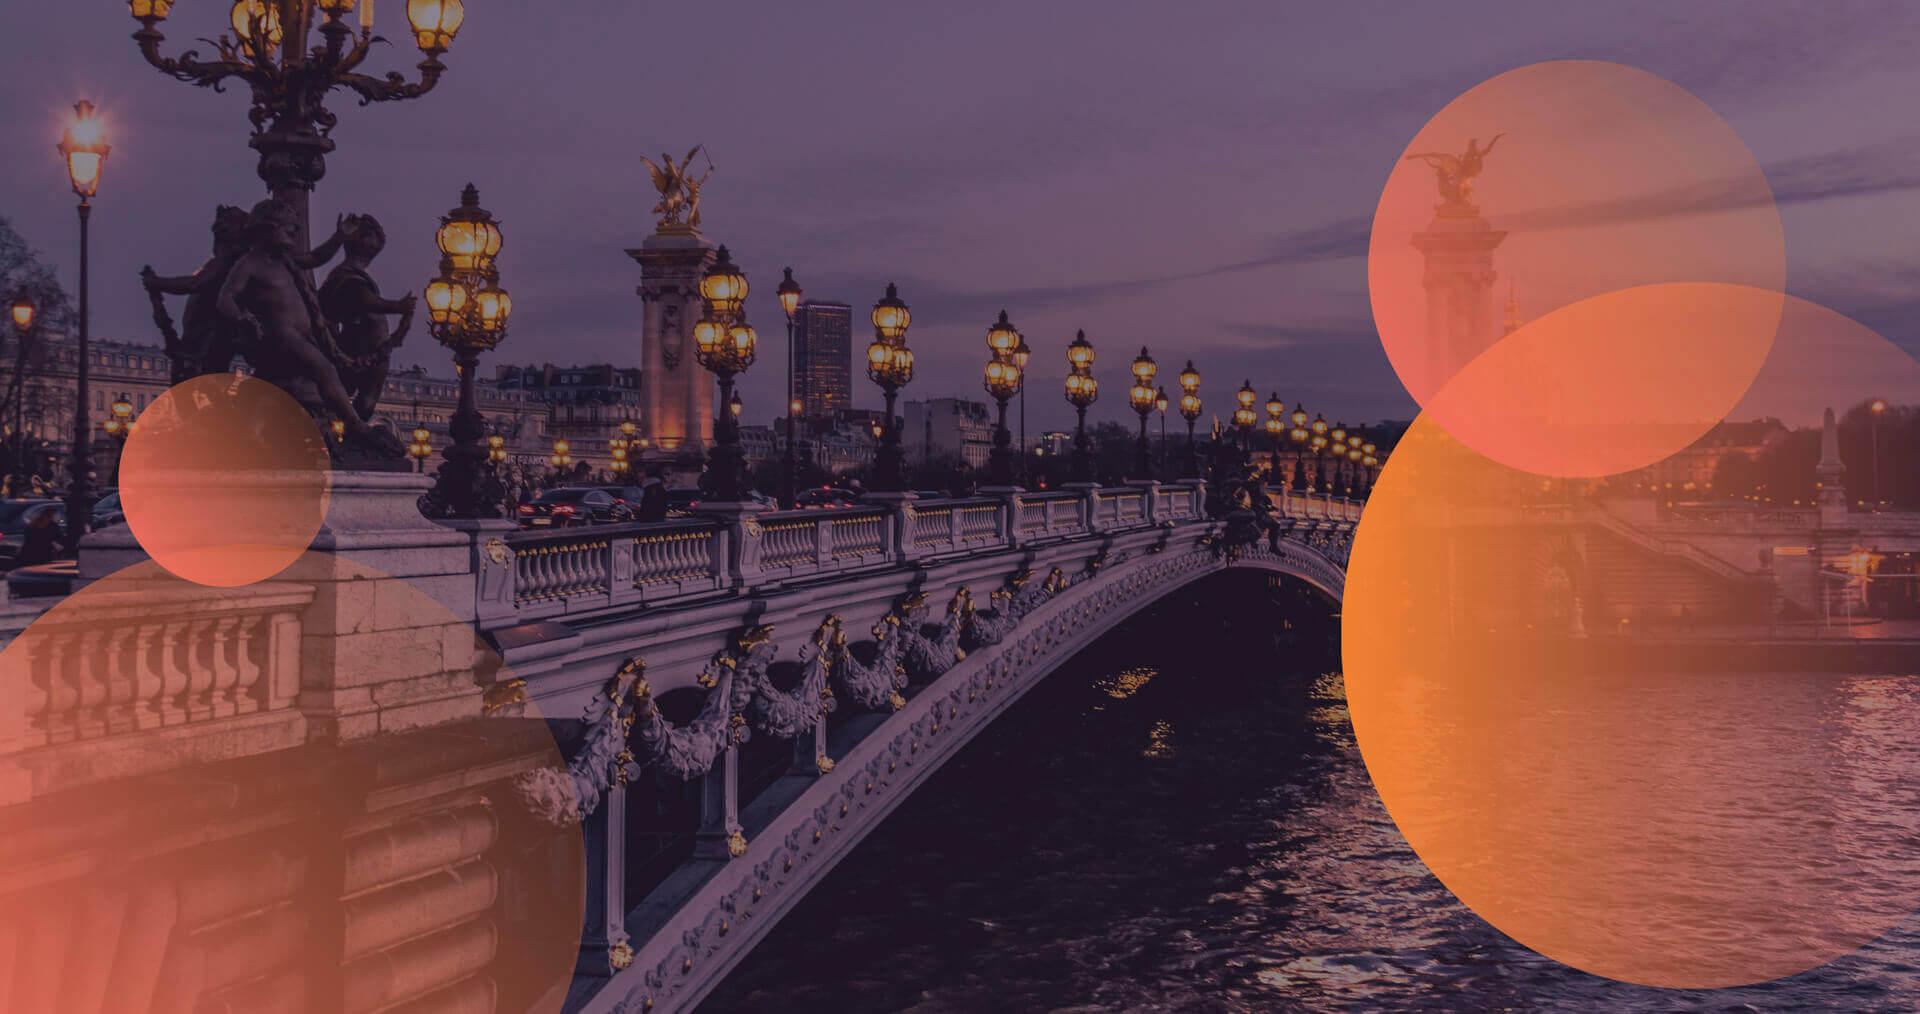 Agile en Seine - s'inscrire